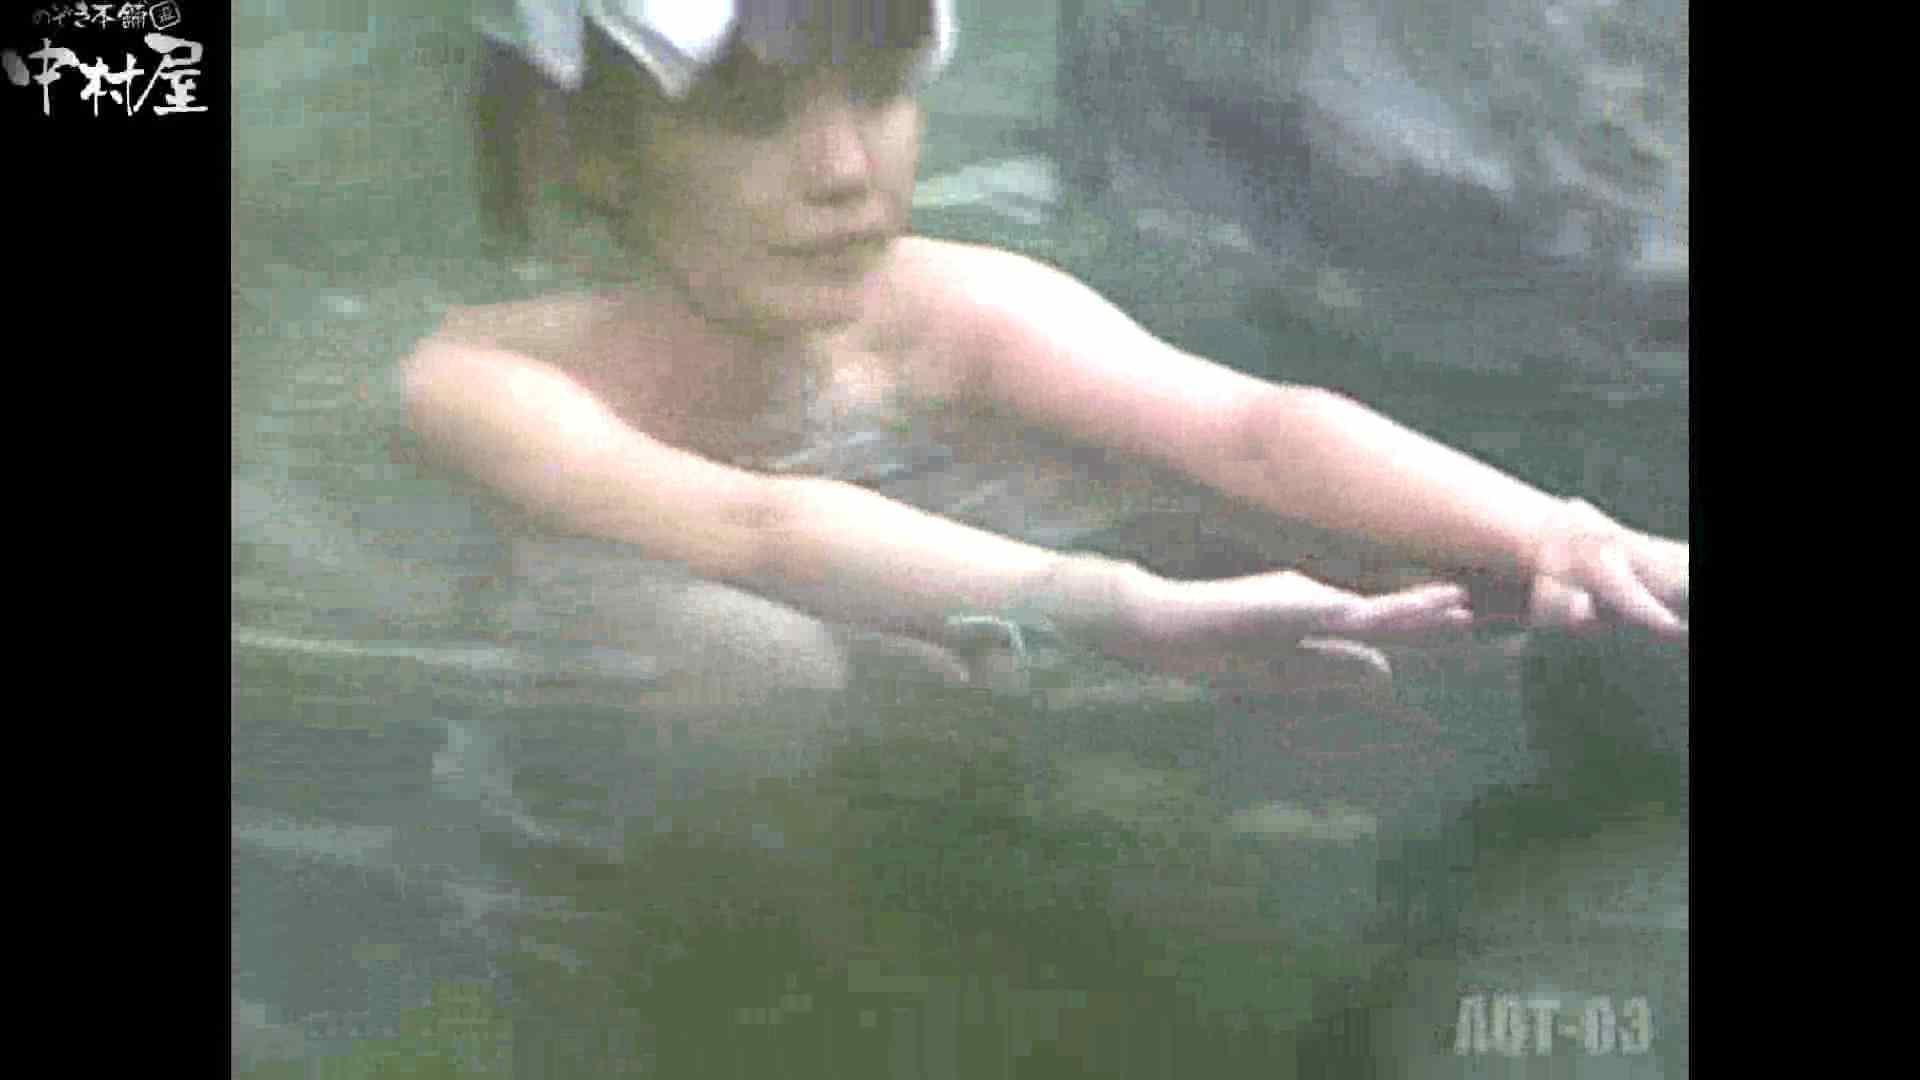 Aquaな露天風呂Vol.867潜入盗撮露天風呂参判湯 其の六 潜入 ぱこり動画紹介 96連発 59